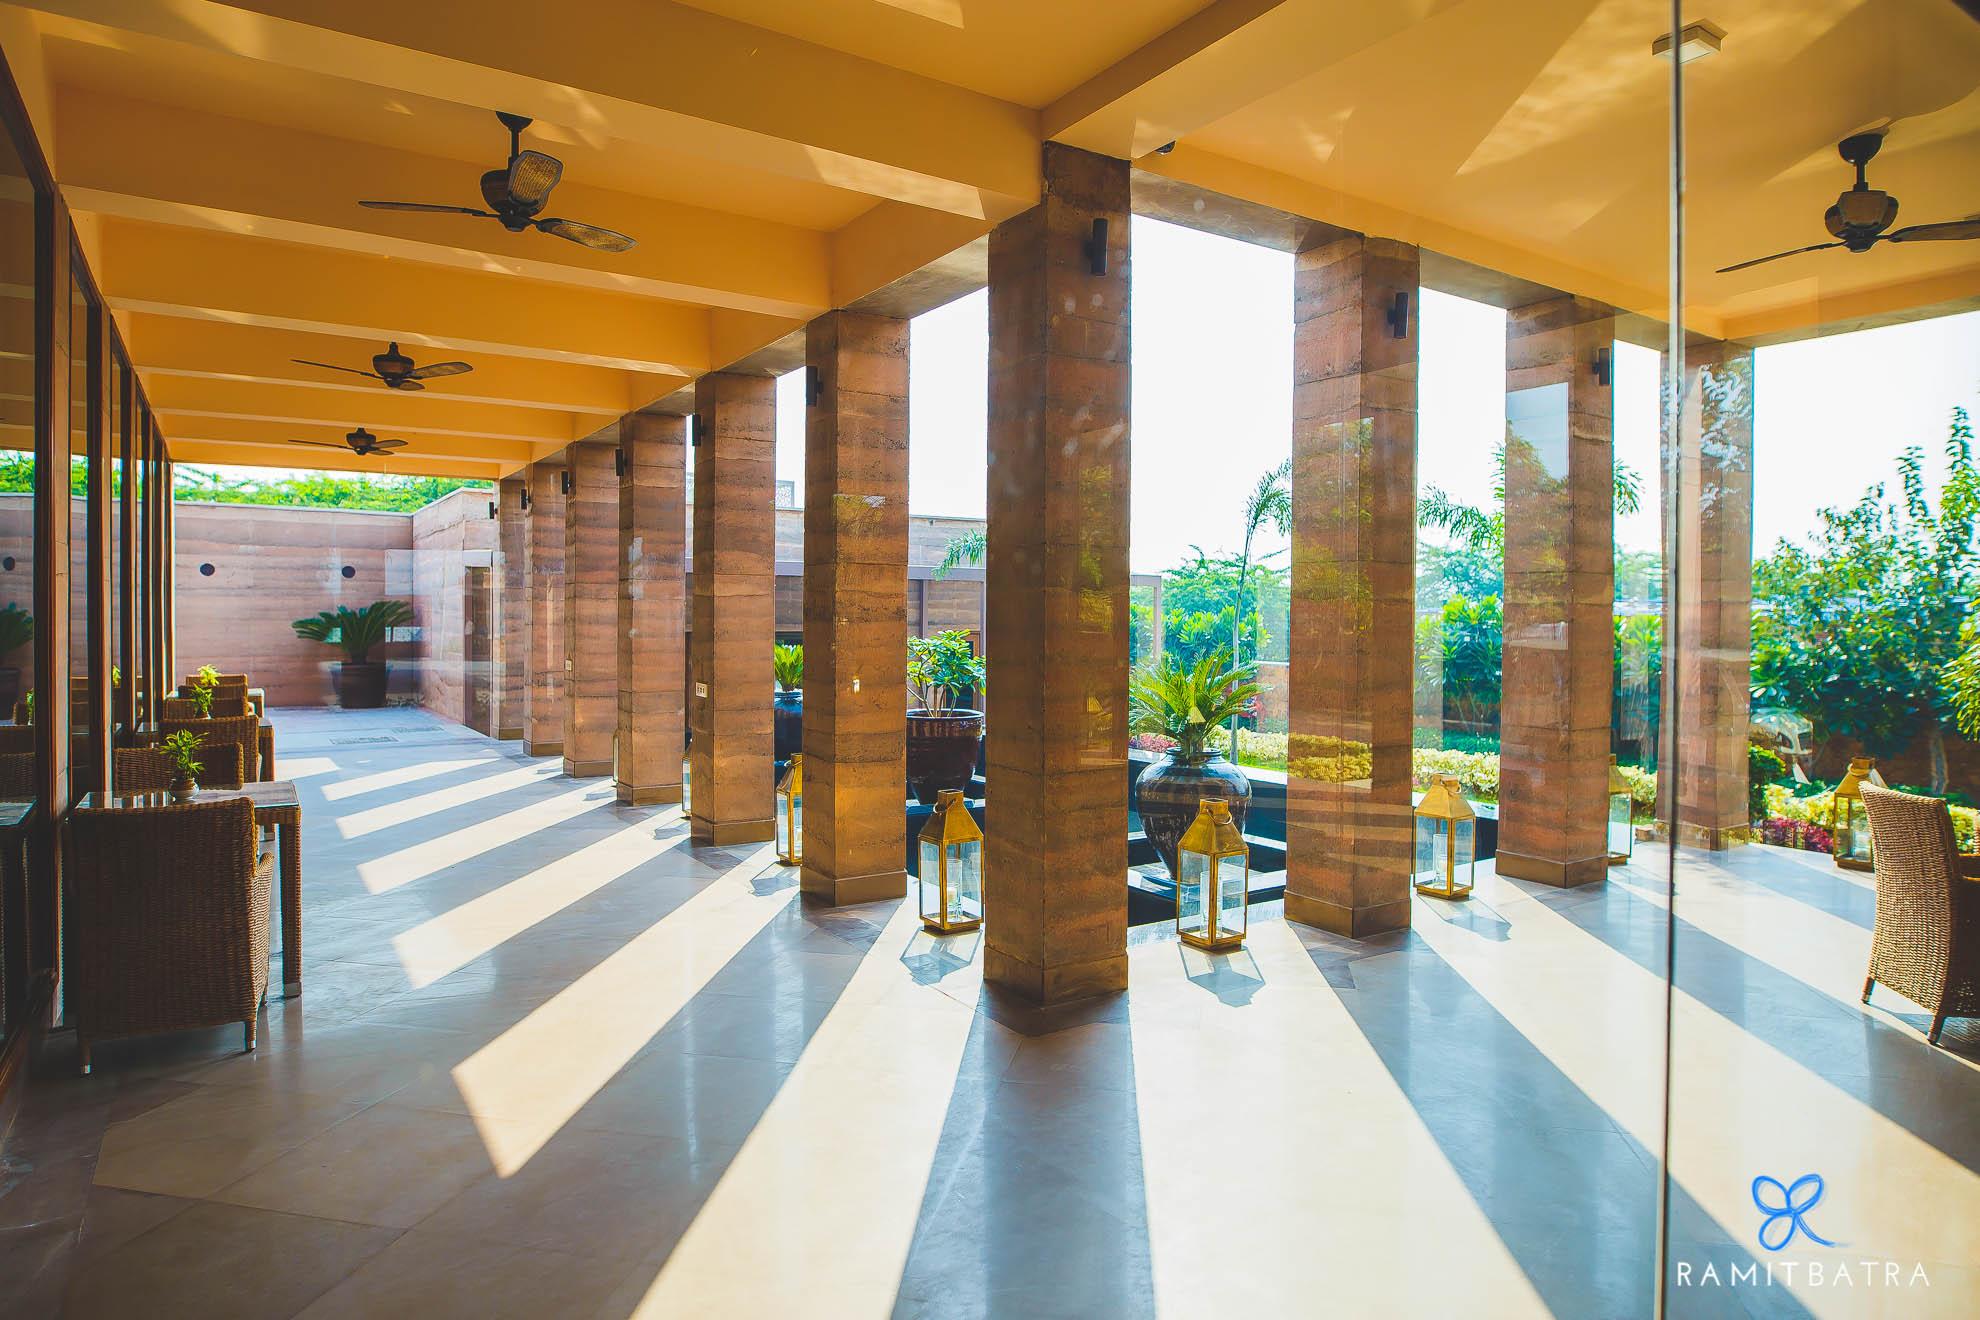 lalit-mangar-hotel-near-delhi-ramitbatra-001